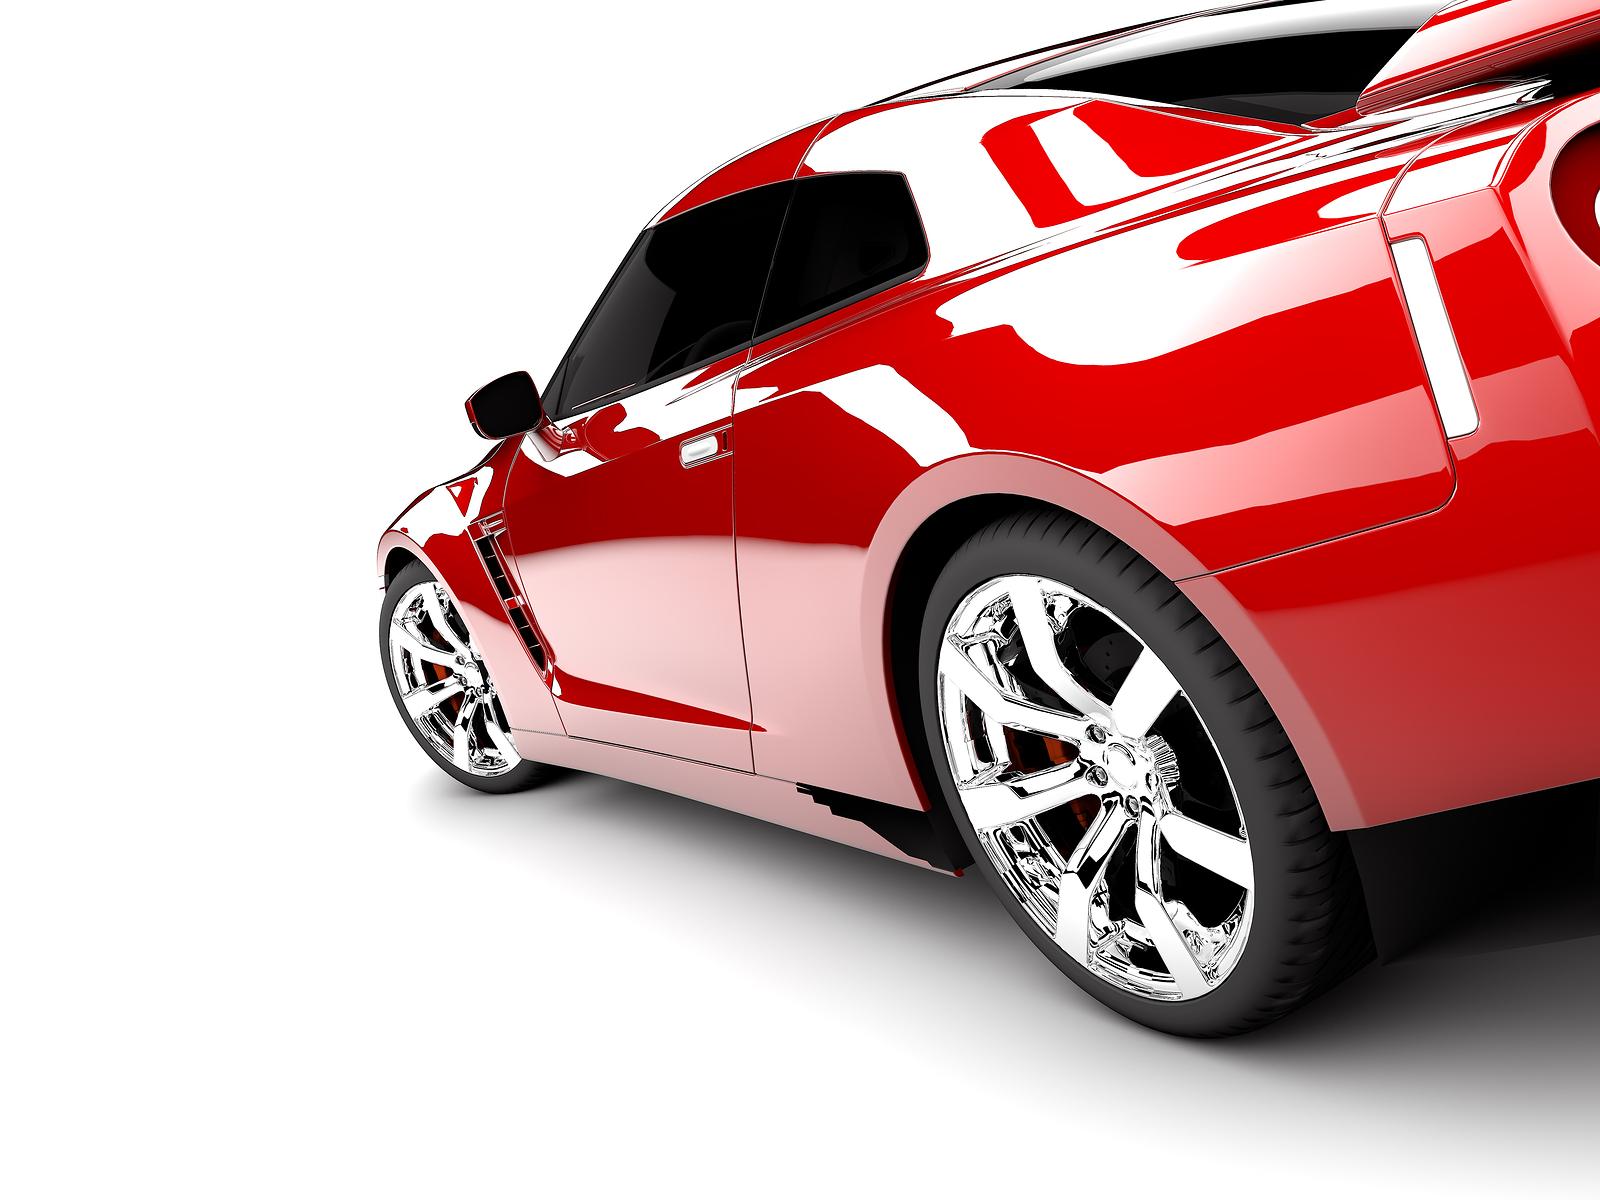 car scratch repair Palm Beach Gardens | scratch and dent Palm Beach Gardens | Road Rash